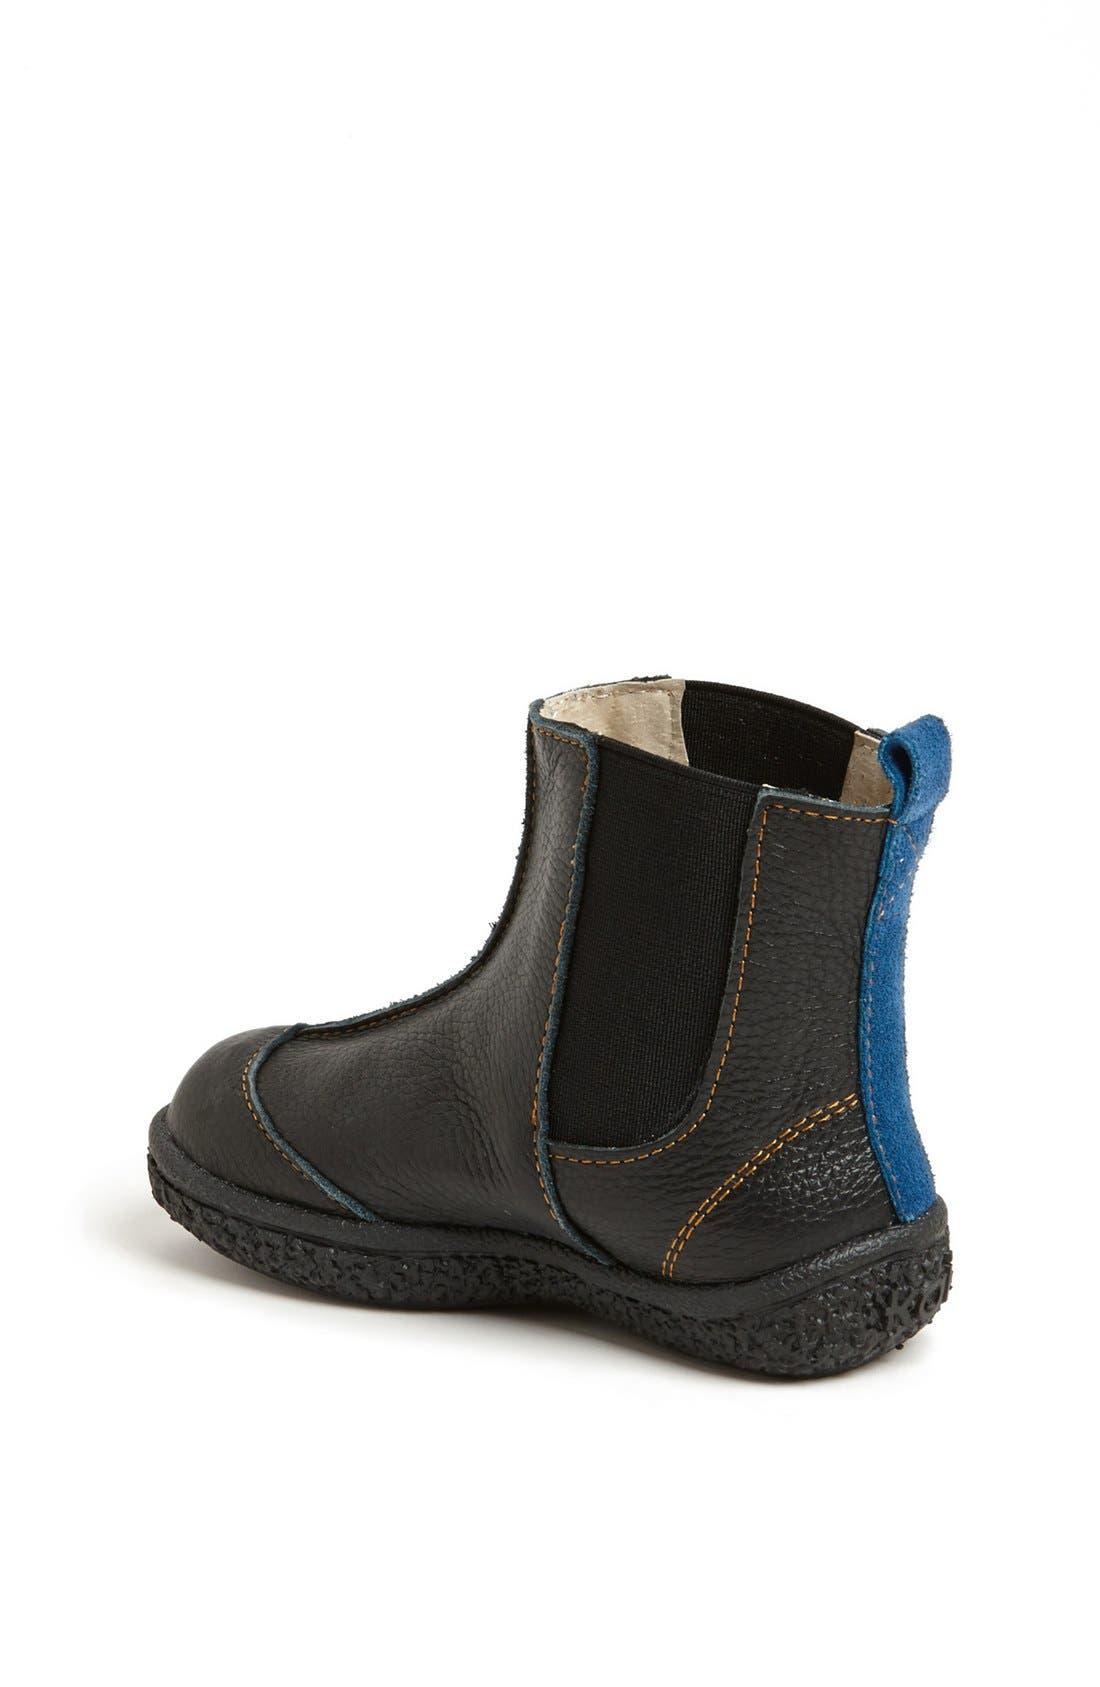 Alternate Image 2  - See Kai Run 'Mateo' Boot (Toddler & Little Kid)